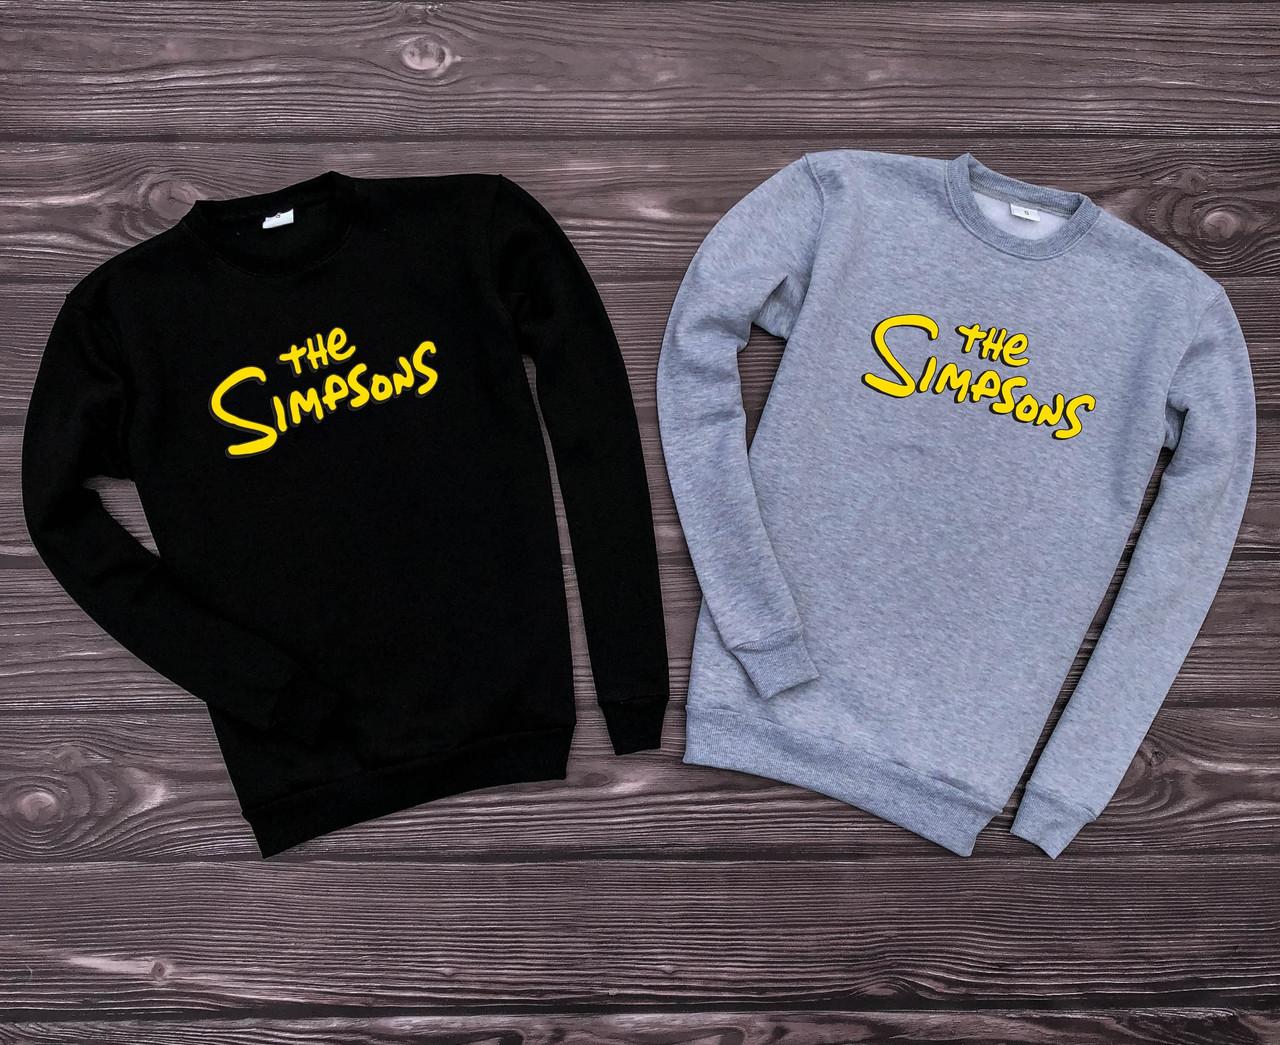 Мужская кофта - Свитшоты The Simpsons черный, серый (утеплен)